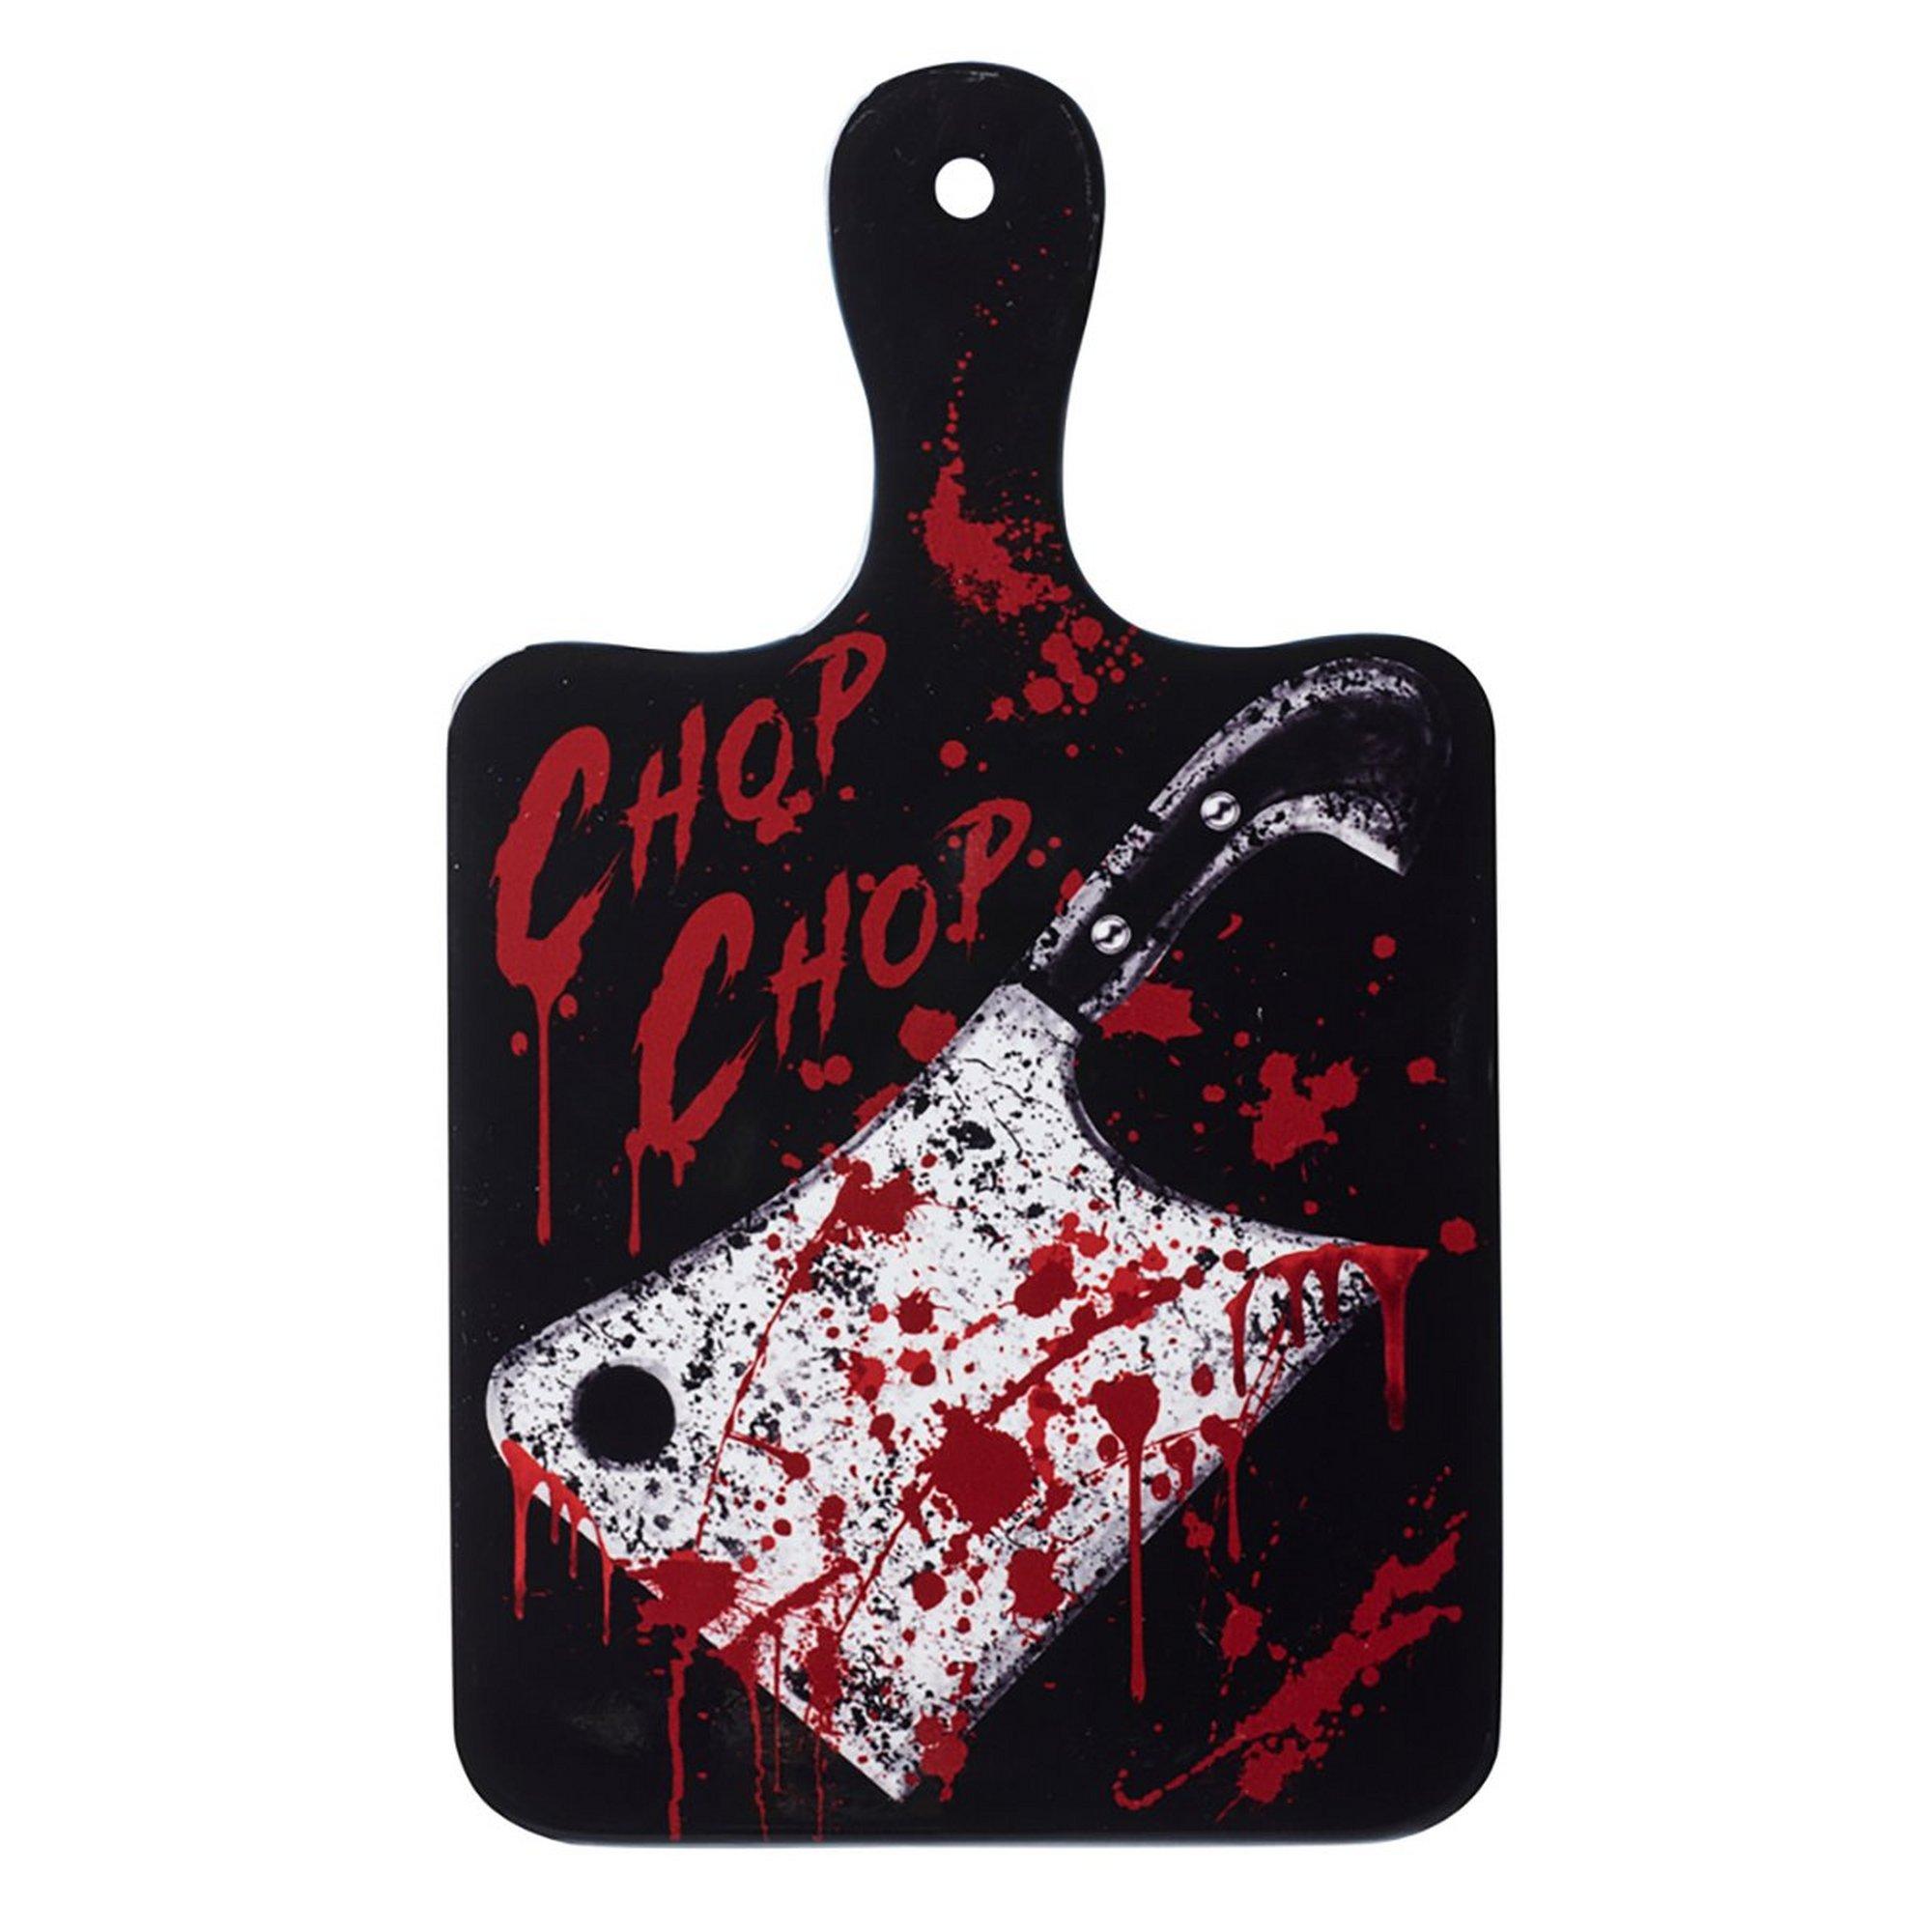 Image of Chop Chop Chopping Board